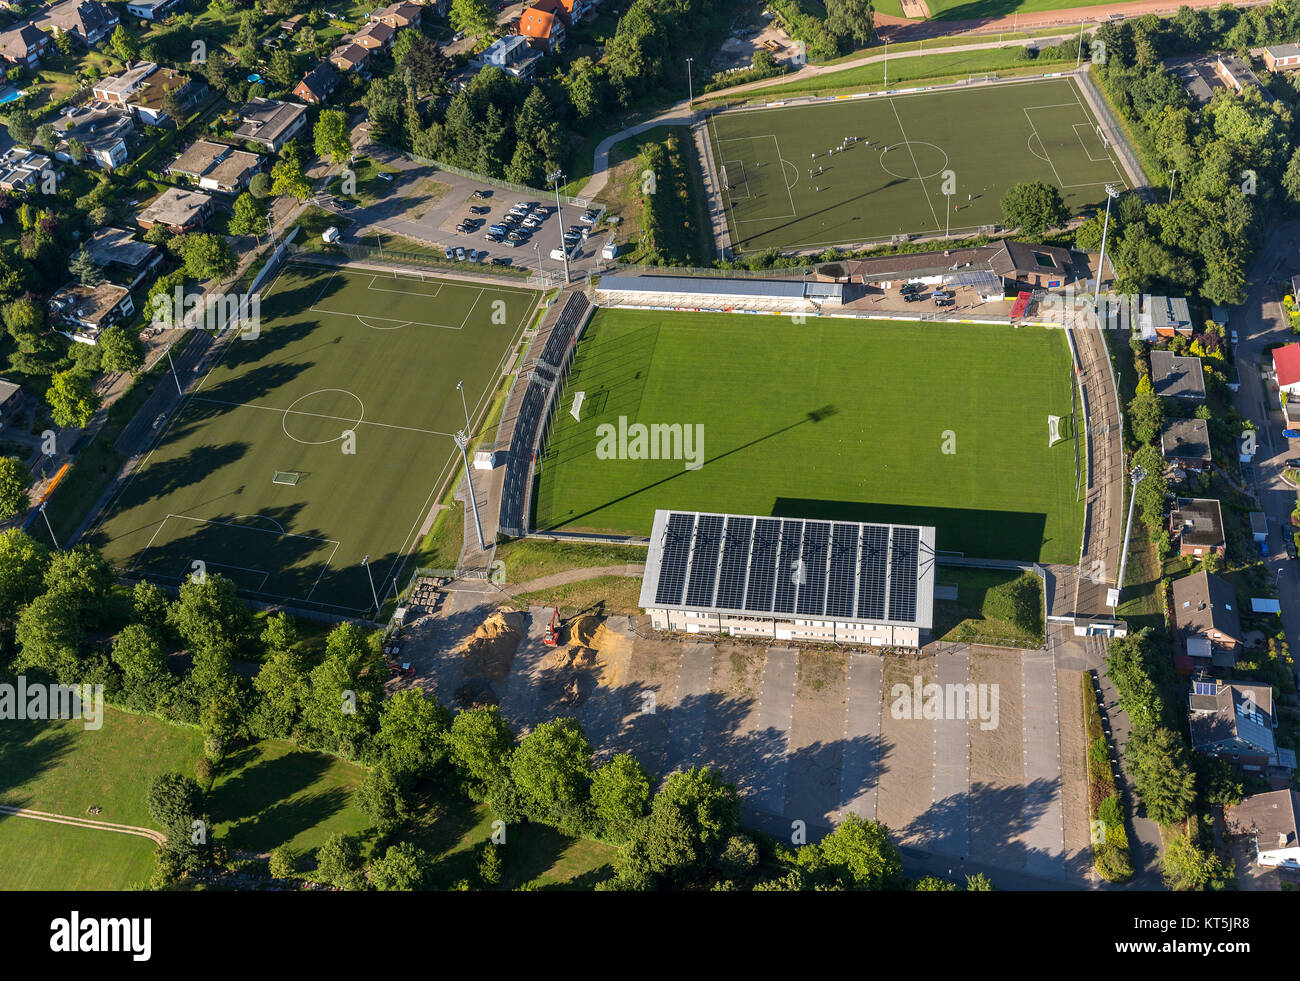 Gustav Hoffmann Stadium, Kleve, Lower Rhine, North Rhine-Westphalia, Germany, Europe, Kleve, Lower Rhine, North - Stock Image